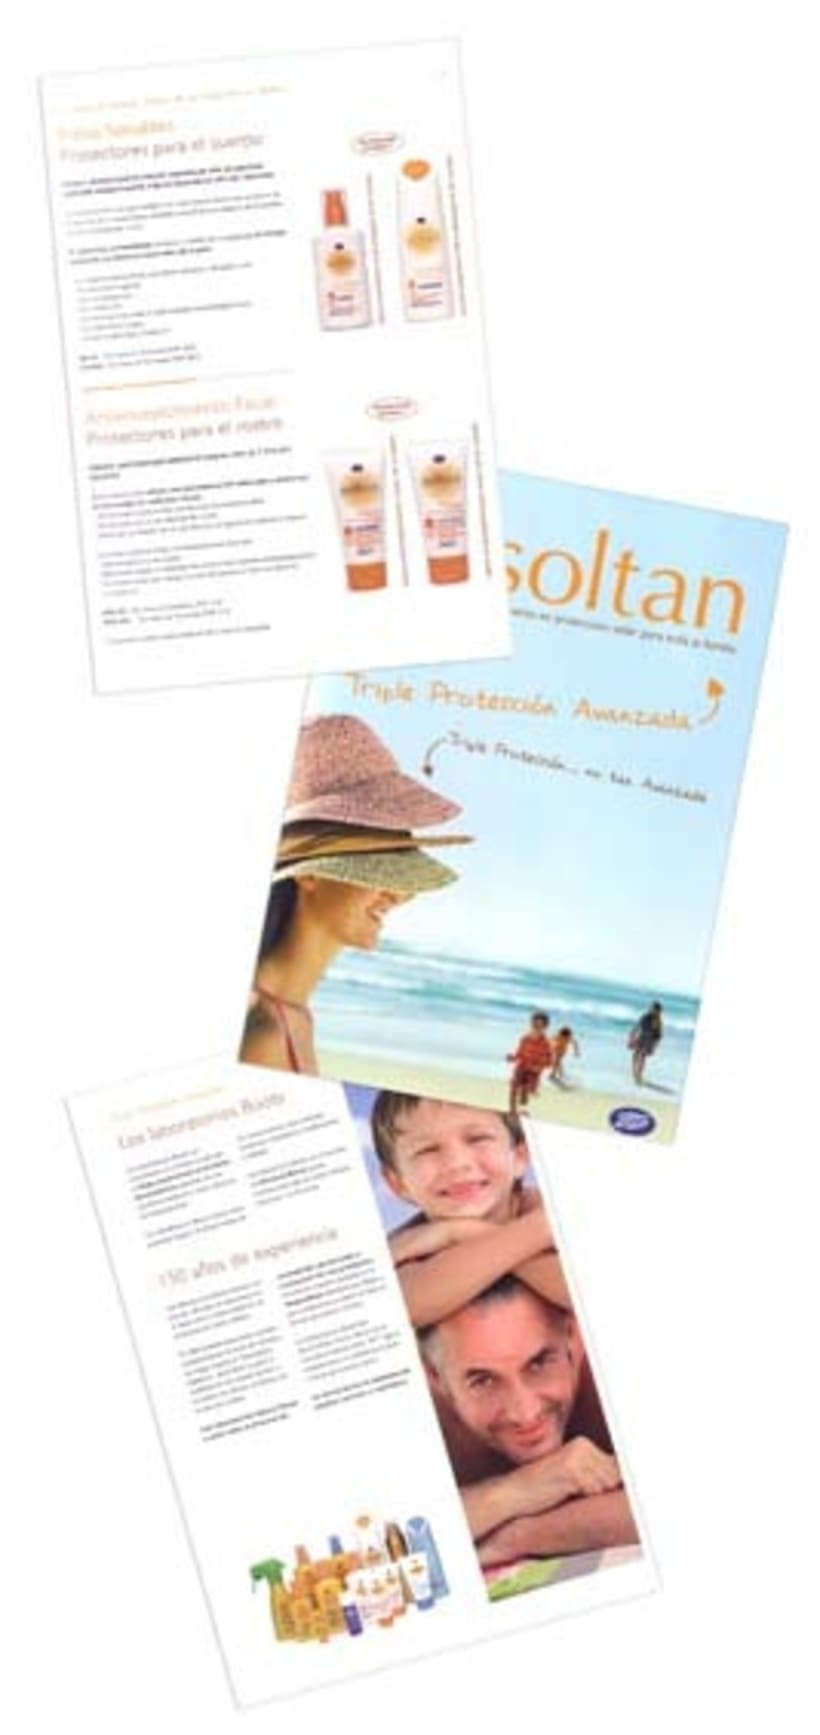 Soltan (crema solar) 3